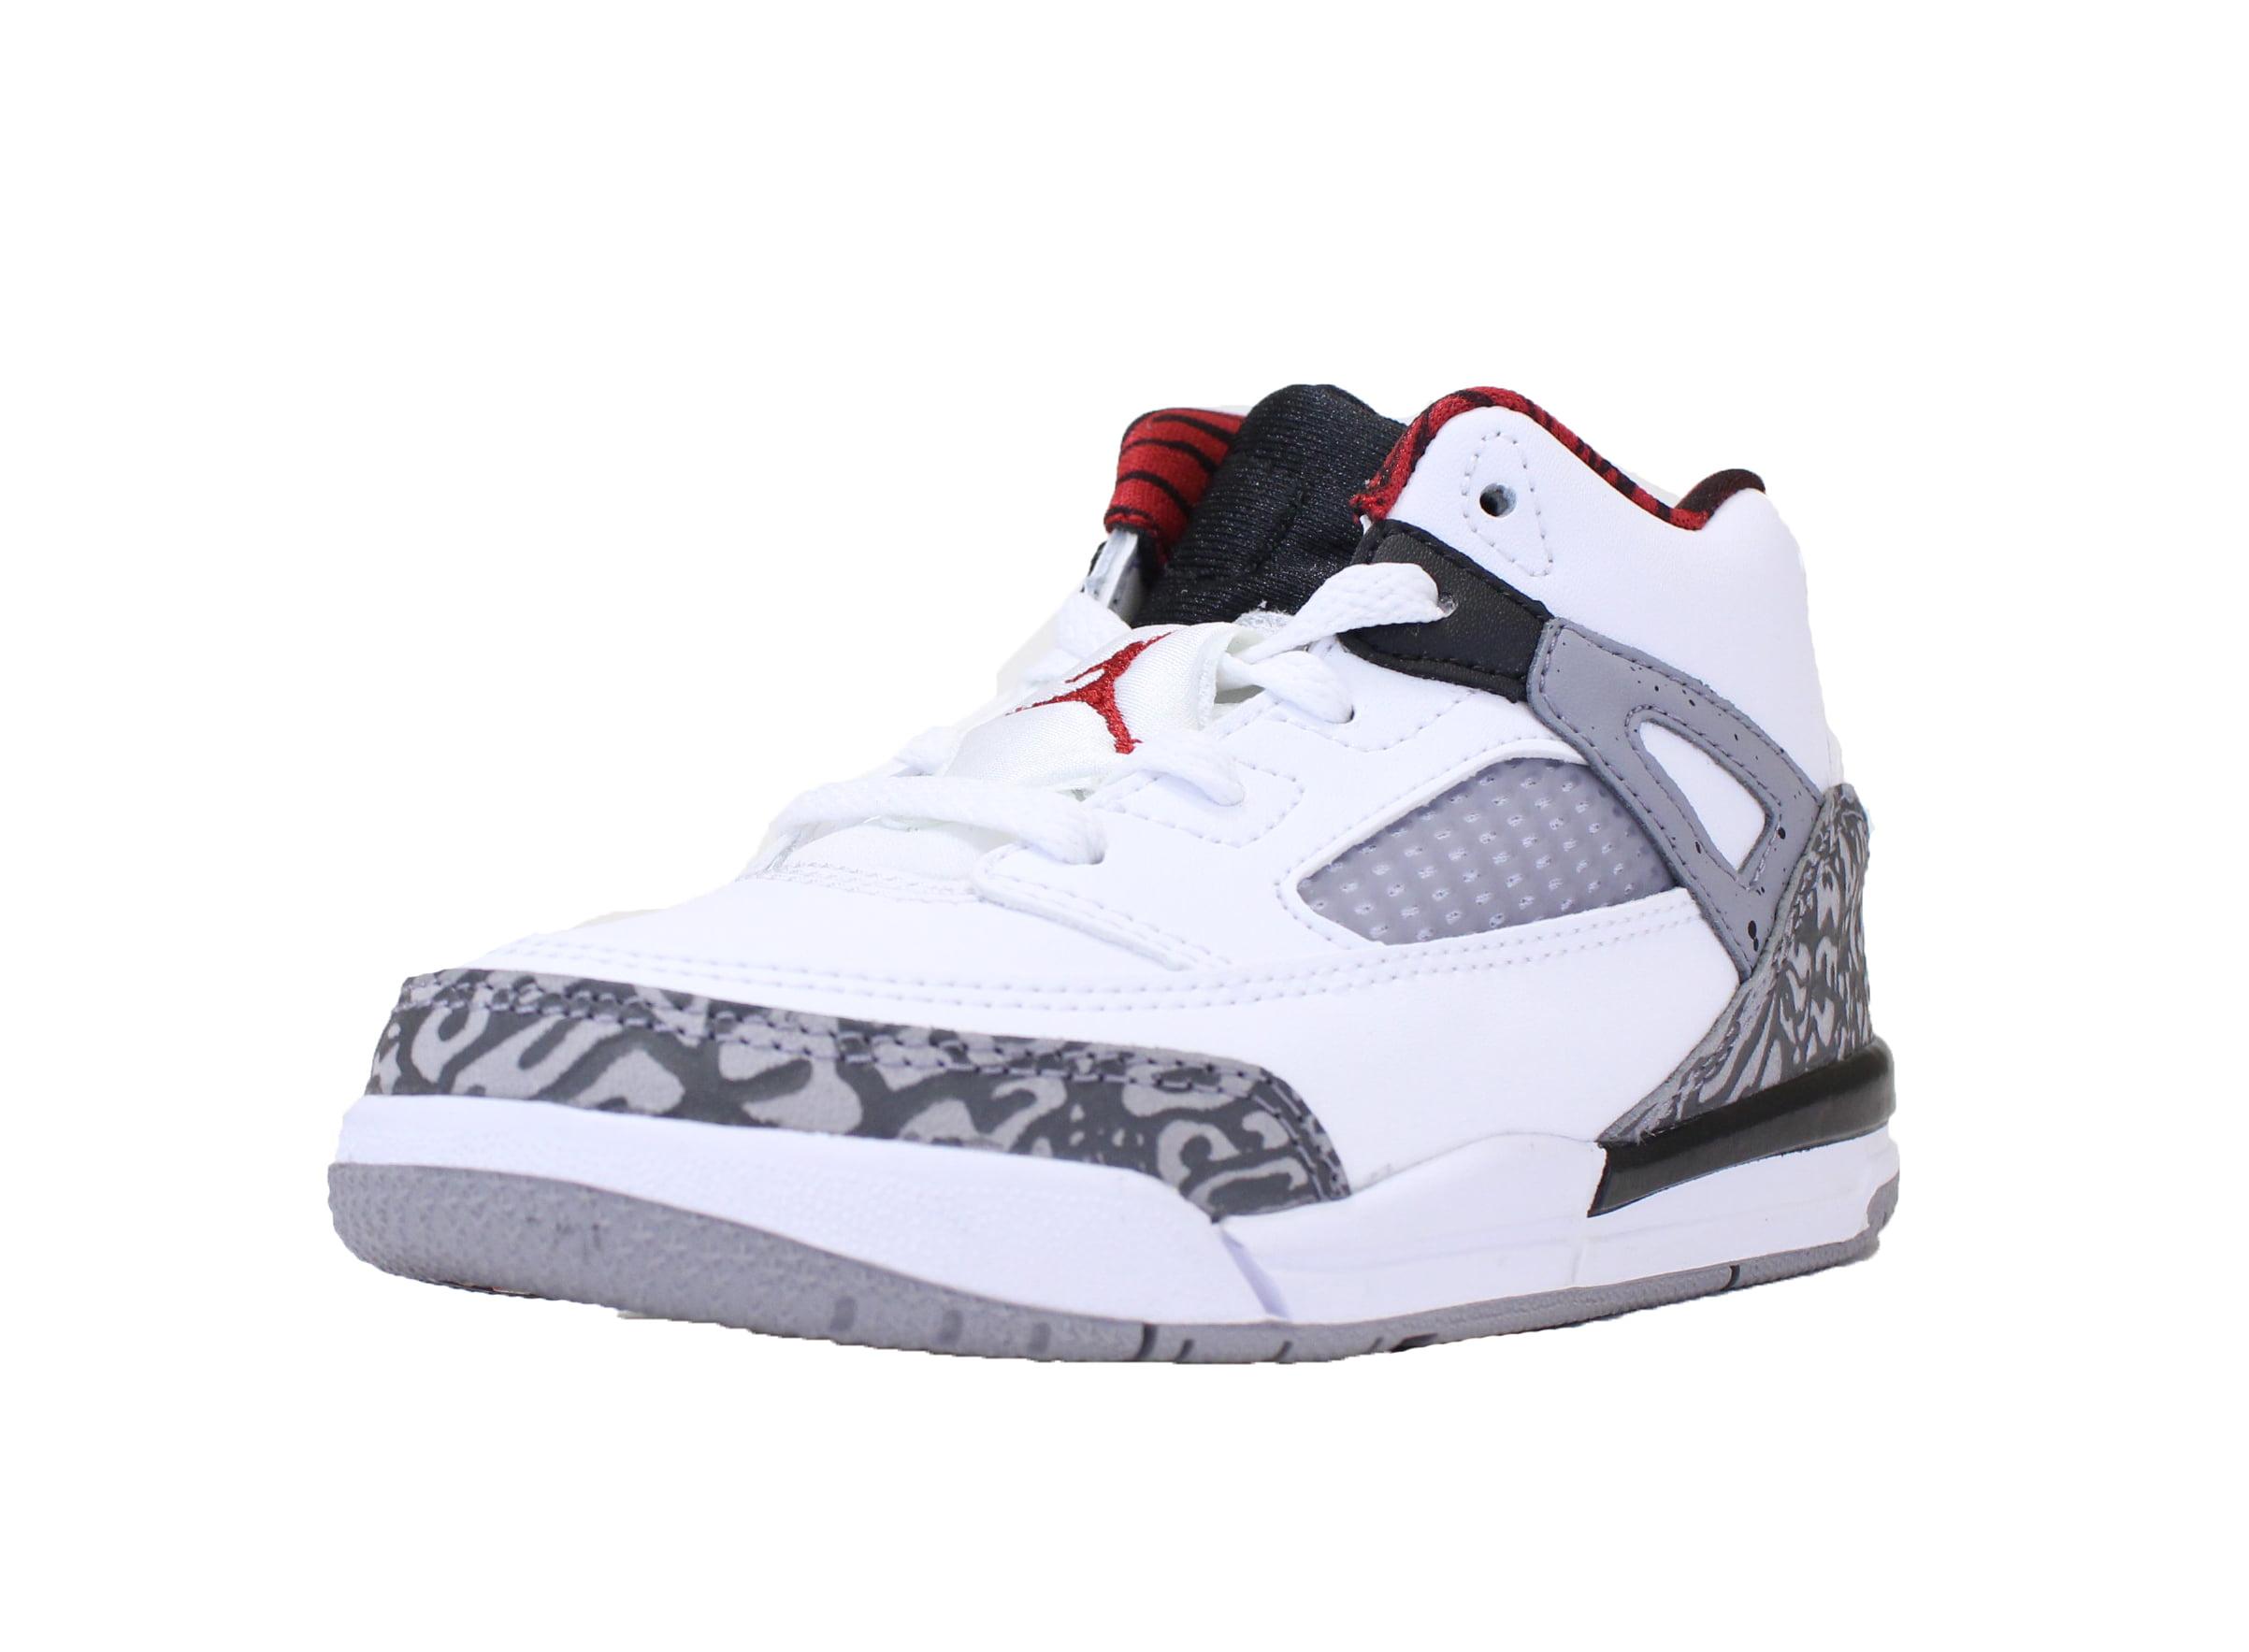 buy online a64a2 16356 Jordan - NIKE AIR JORDAN SPIZIKE TD SZ 10 C TODDLER WHITE RED CEMENT GREY  BLACK 317701 122 - Walmart.com